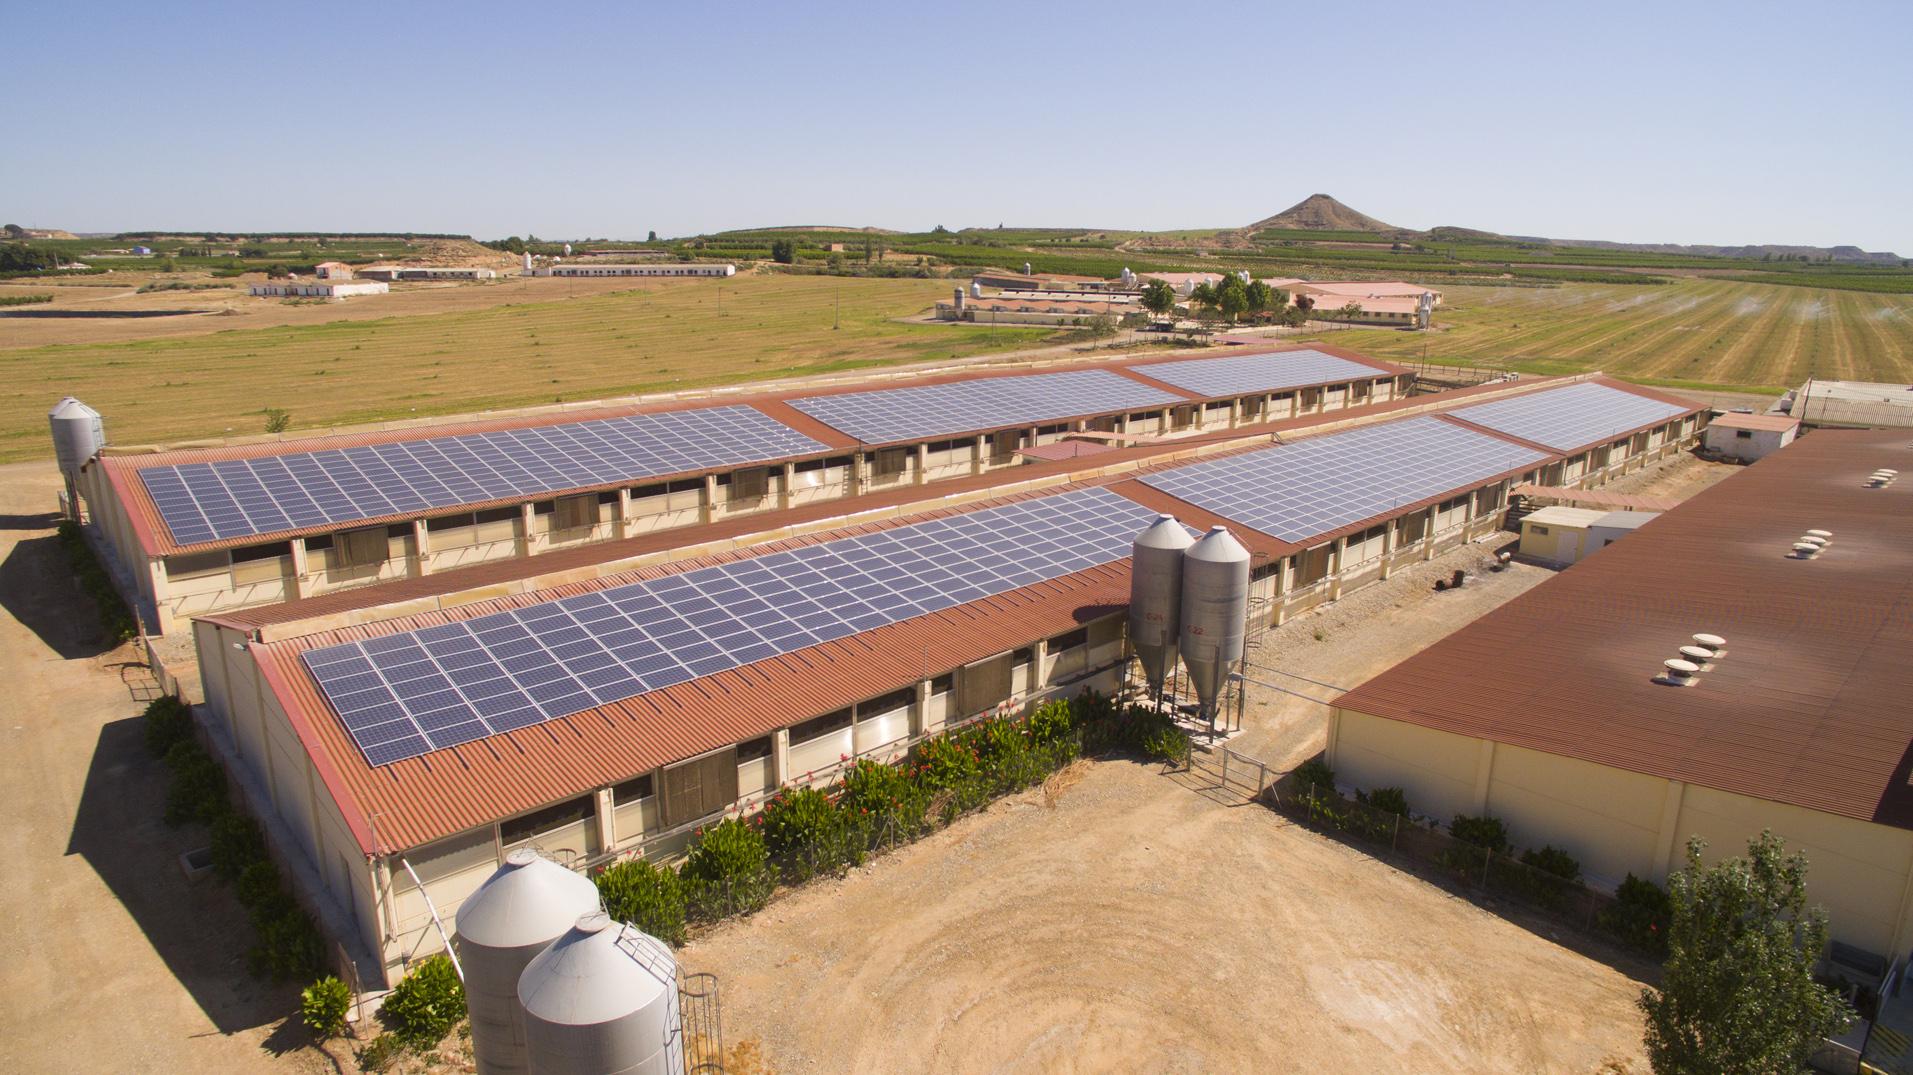 Fotovoltaico in agricoltura